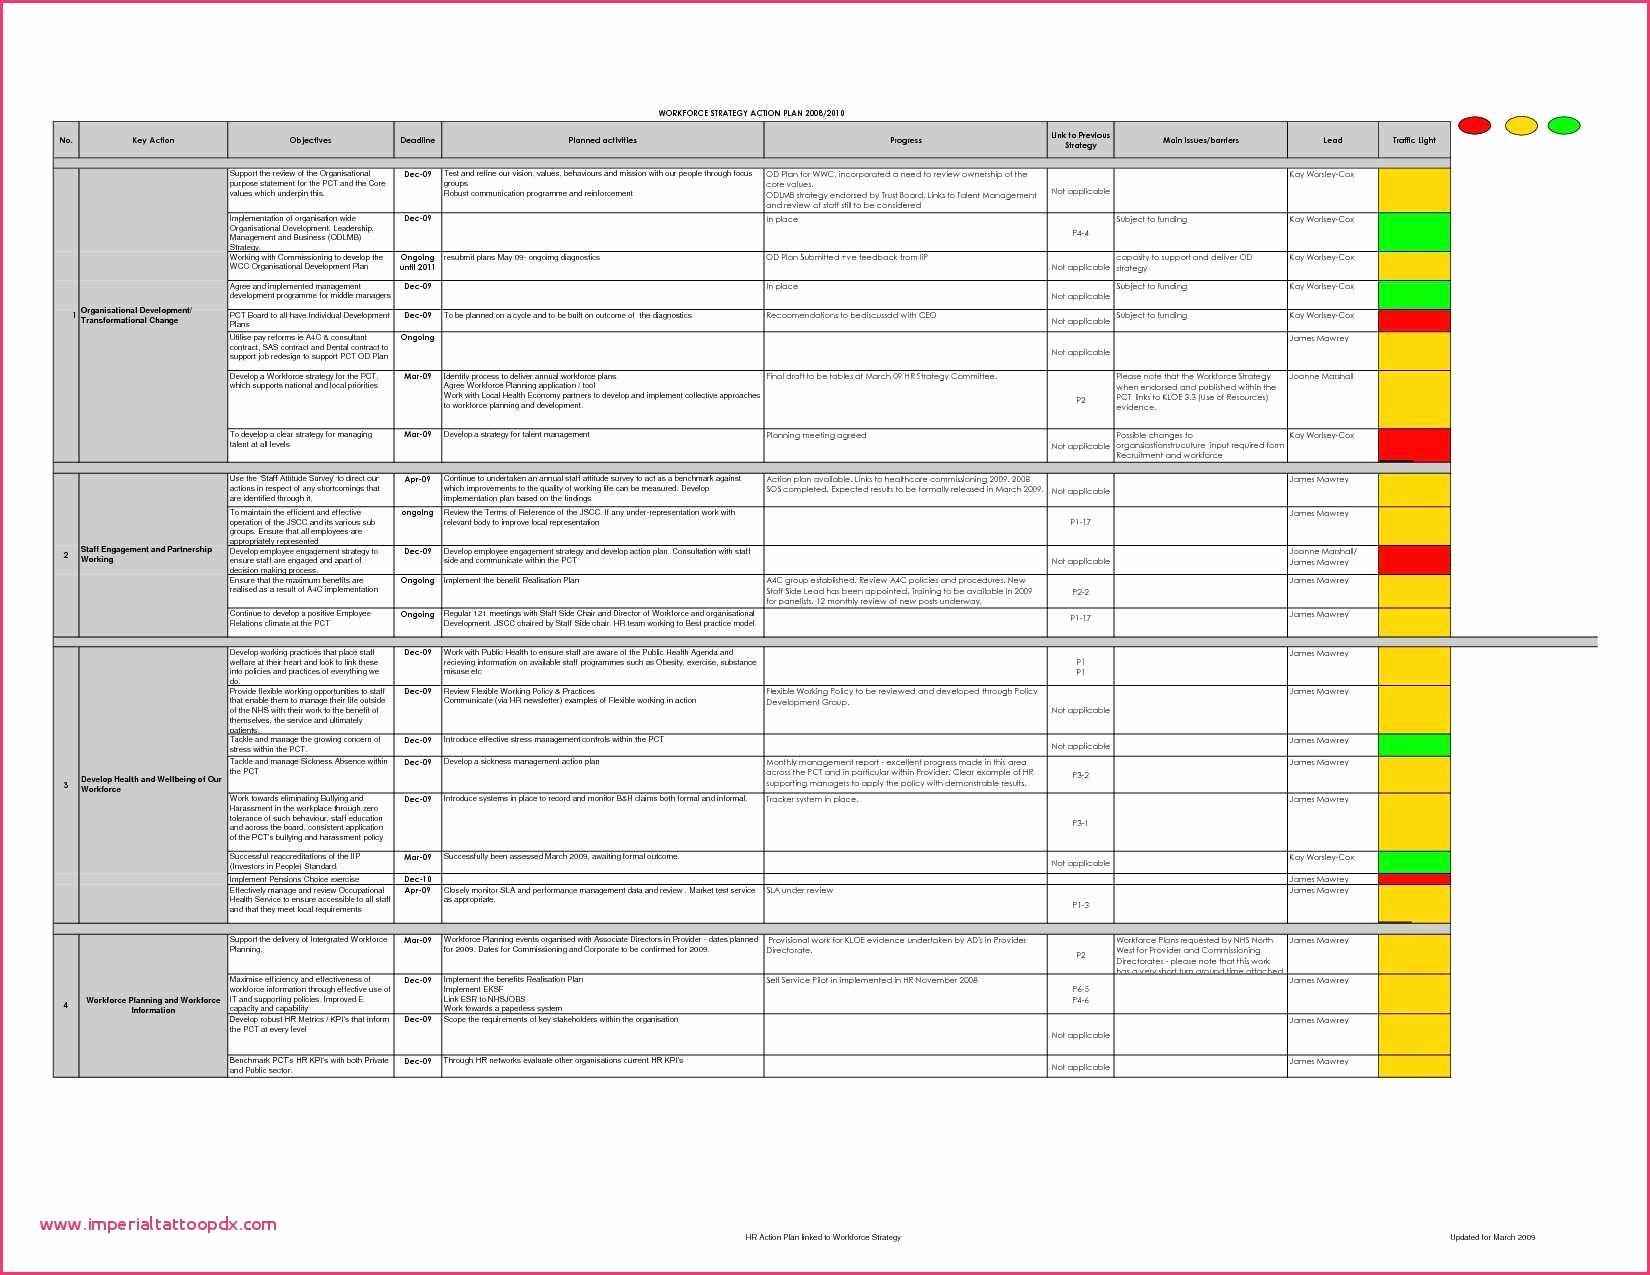 Lawn Care Schedule Spreadsheet Spreadsheet Downloa Lawn Care Schedule Spreadsheet Free Lawn